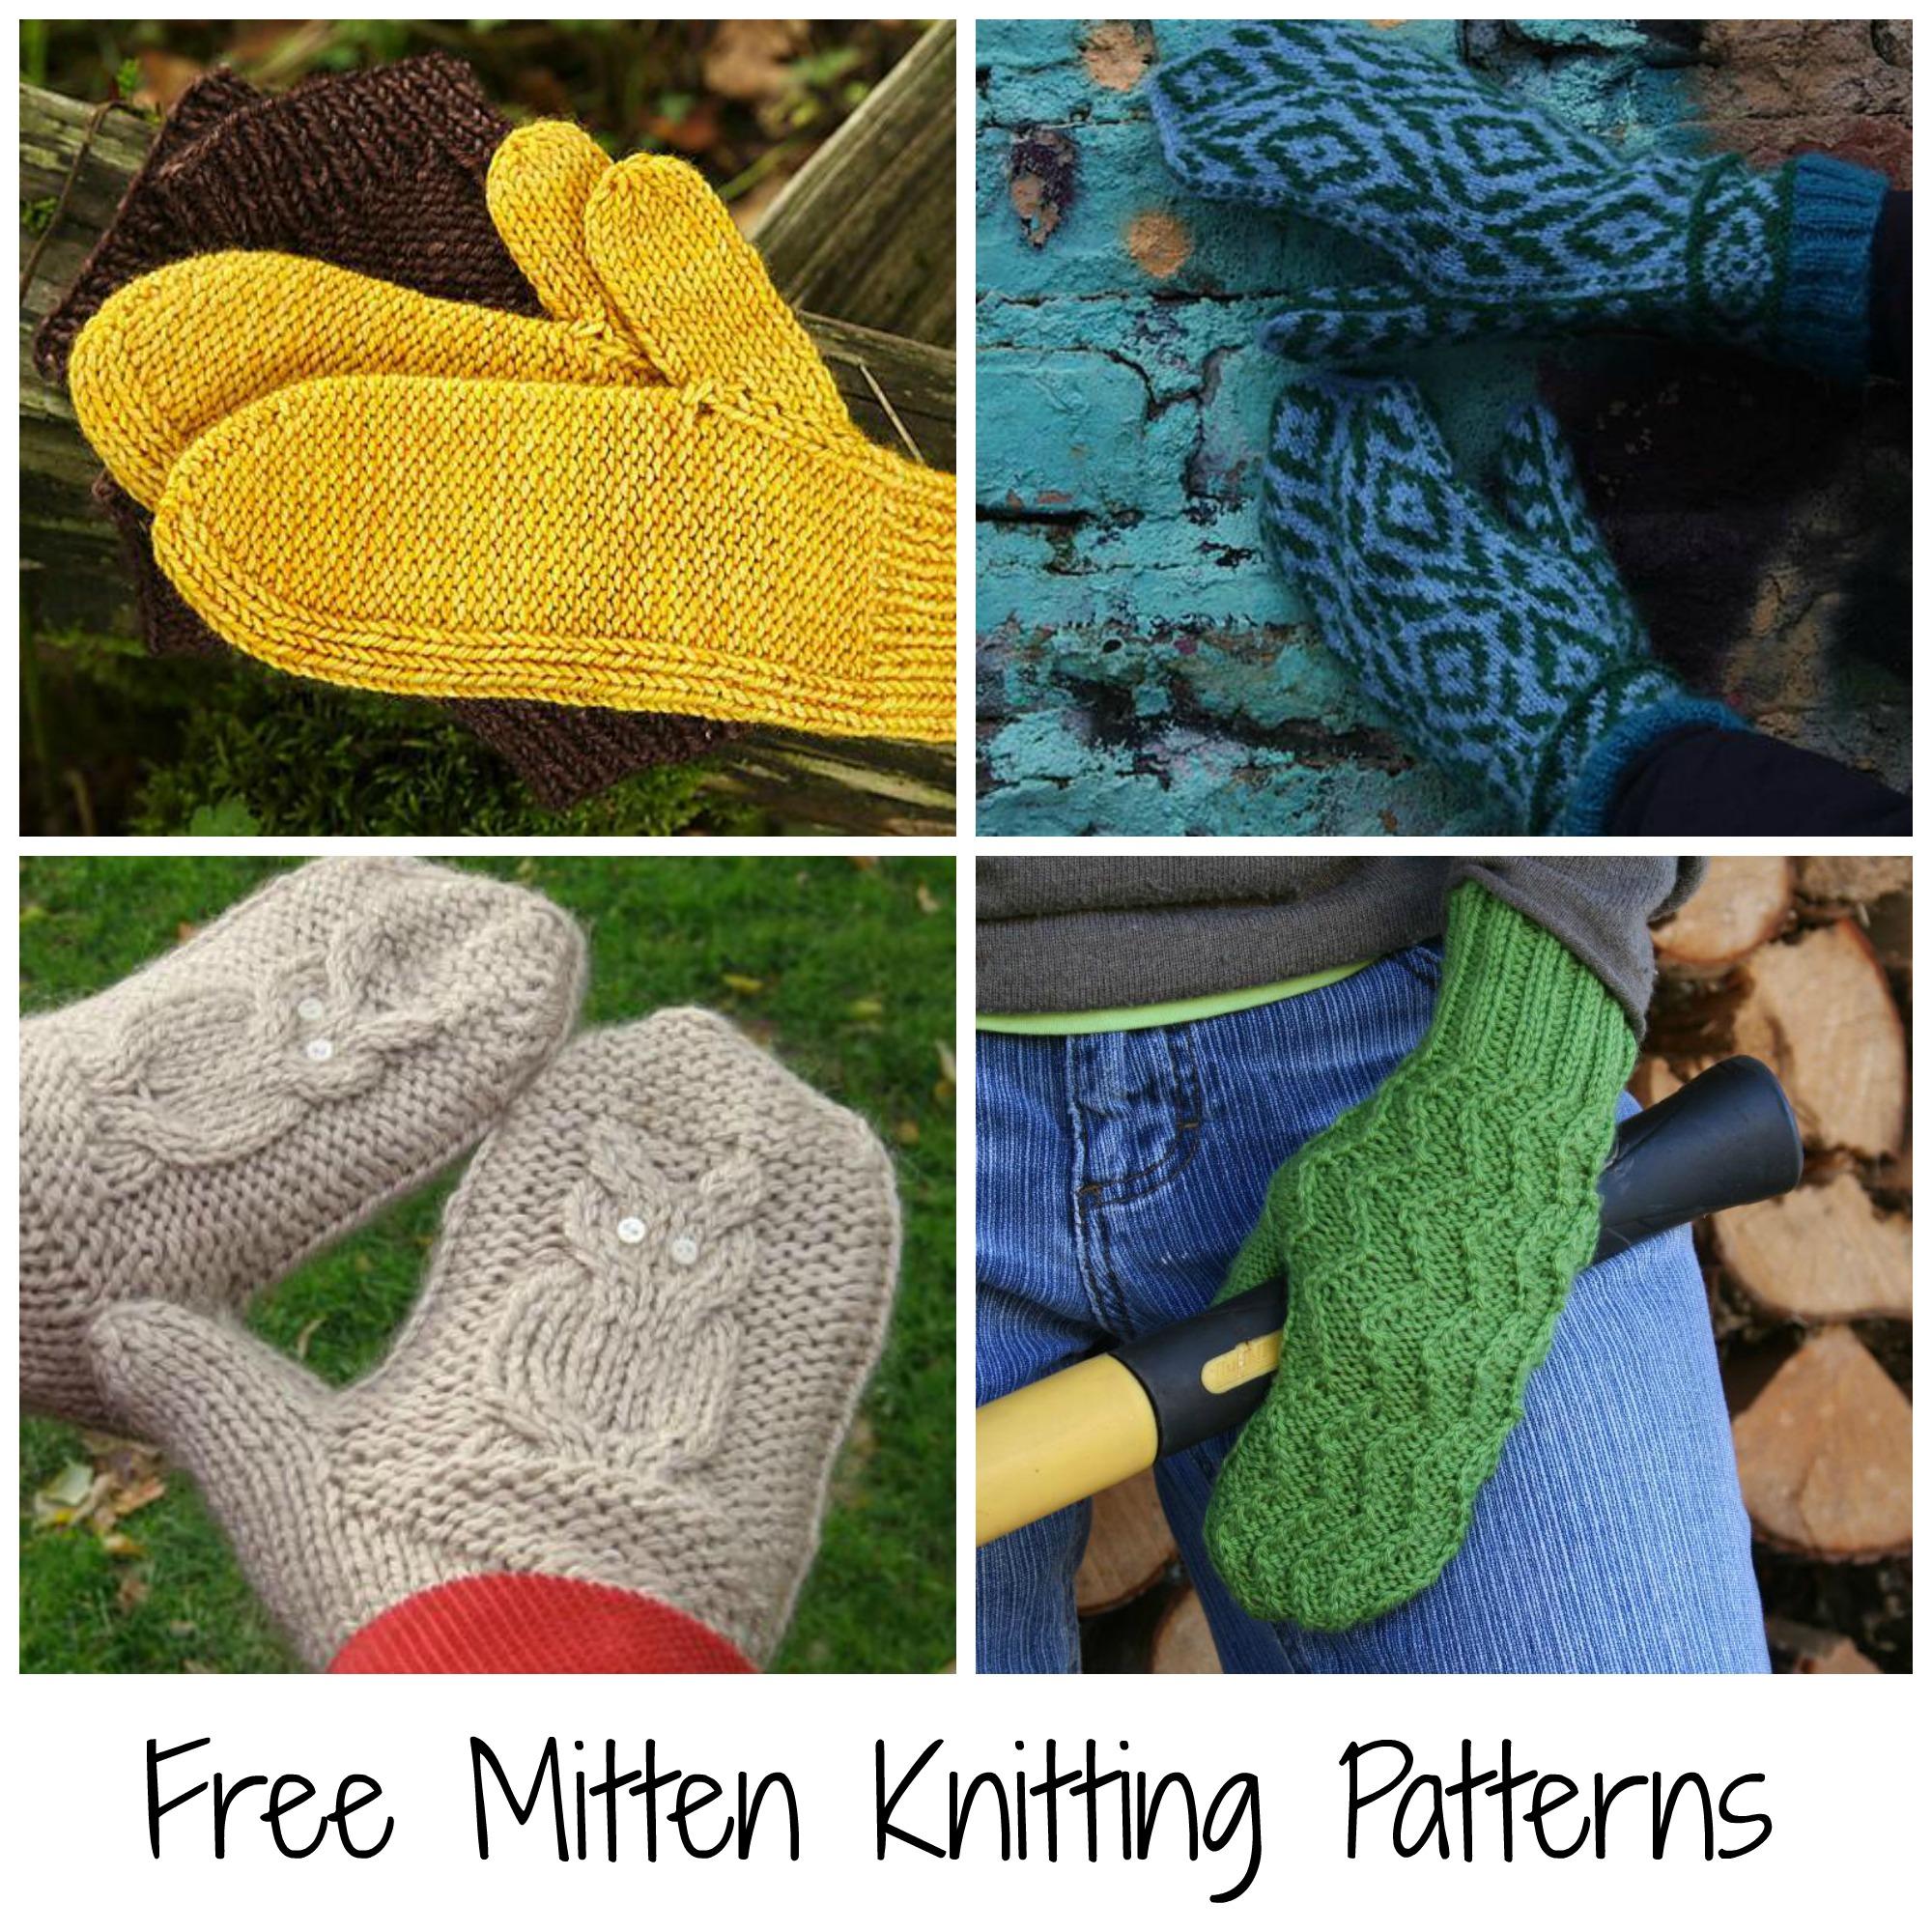 Free Mitten Knitting Patterns